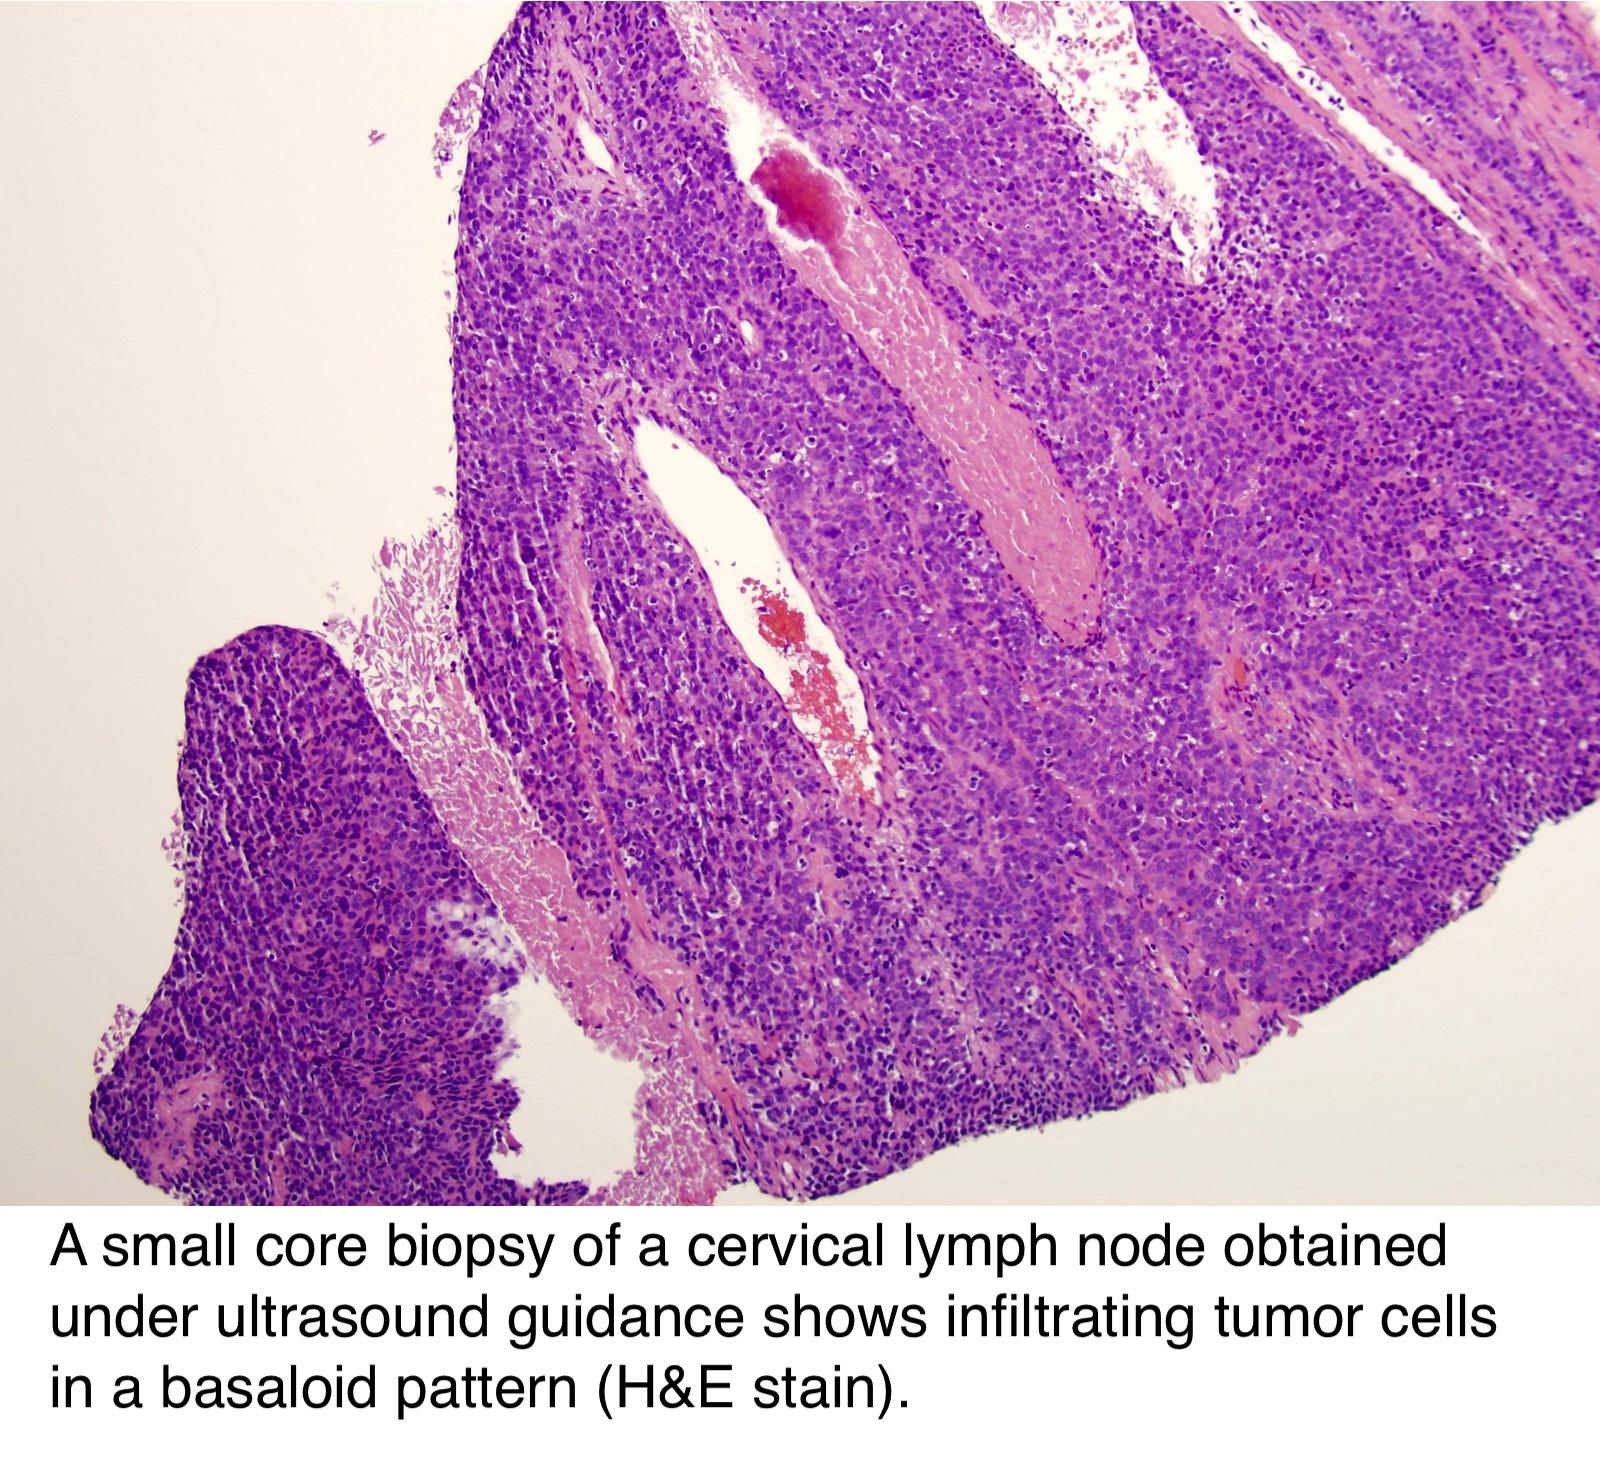 hpv associated oropharyngeal cancer pathology outlines cele mai eficiente medicamente antiparazitare pentru oameni